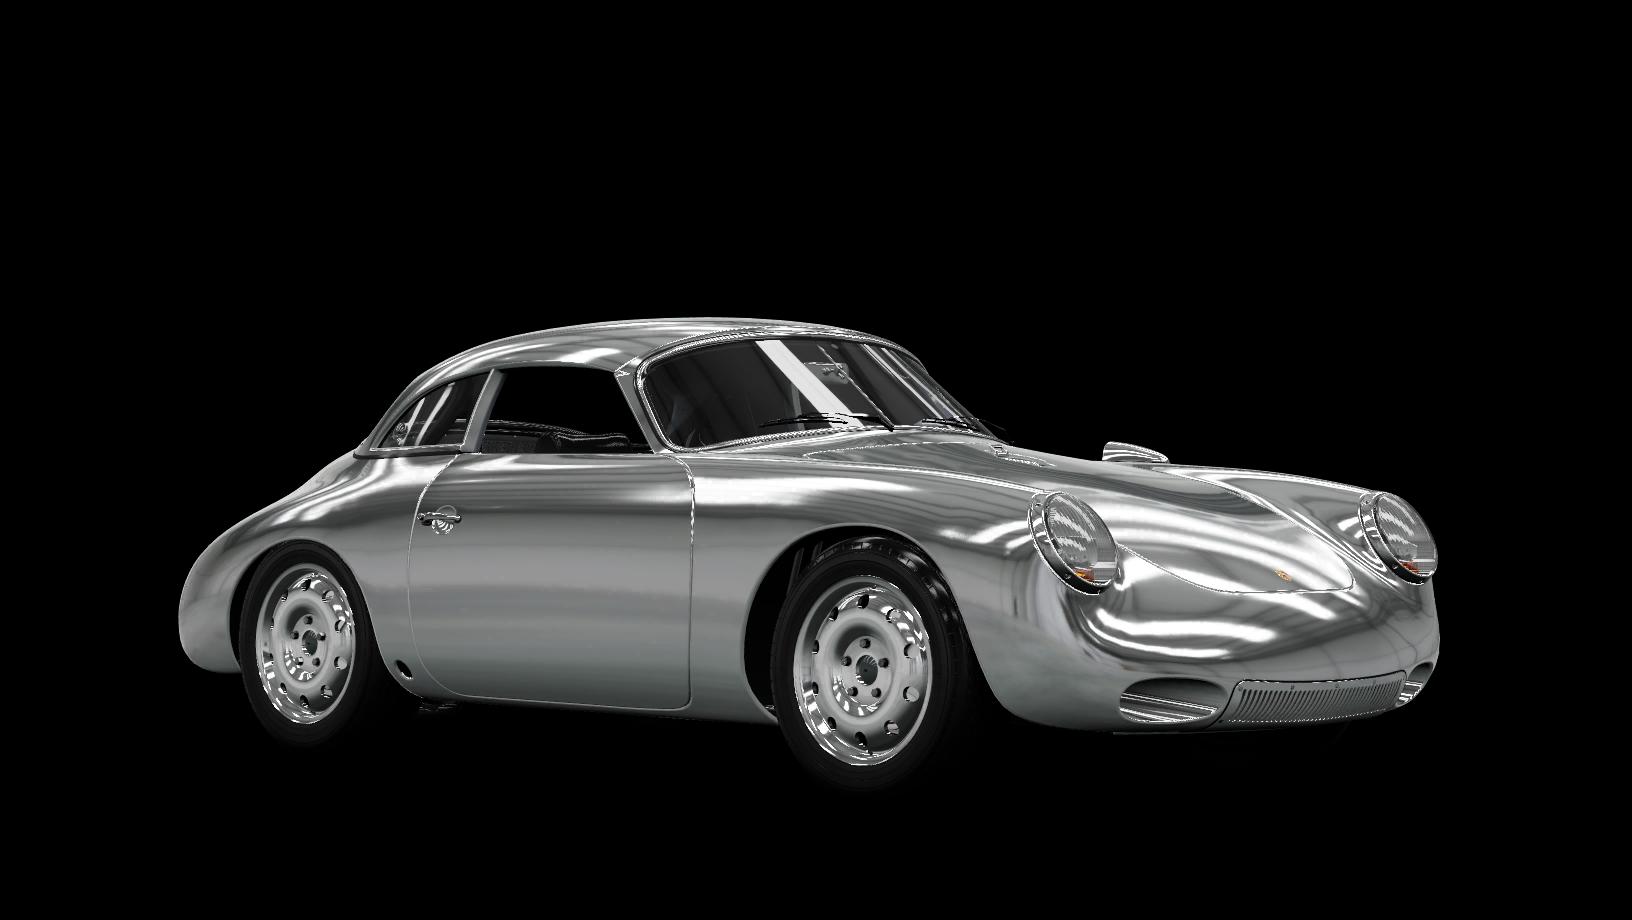 Porsche 356 C Cabriolet Emory Special